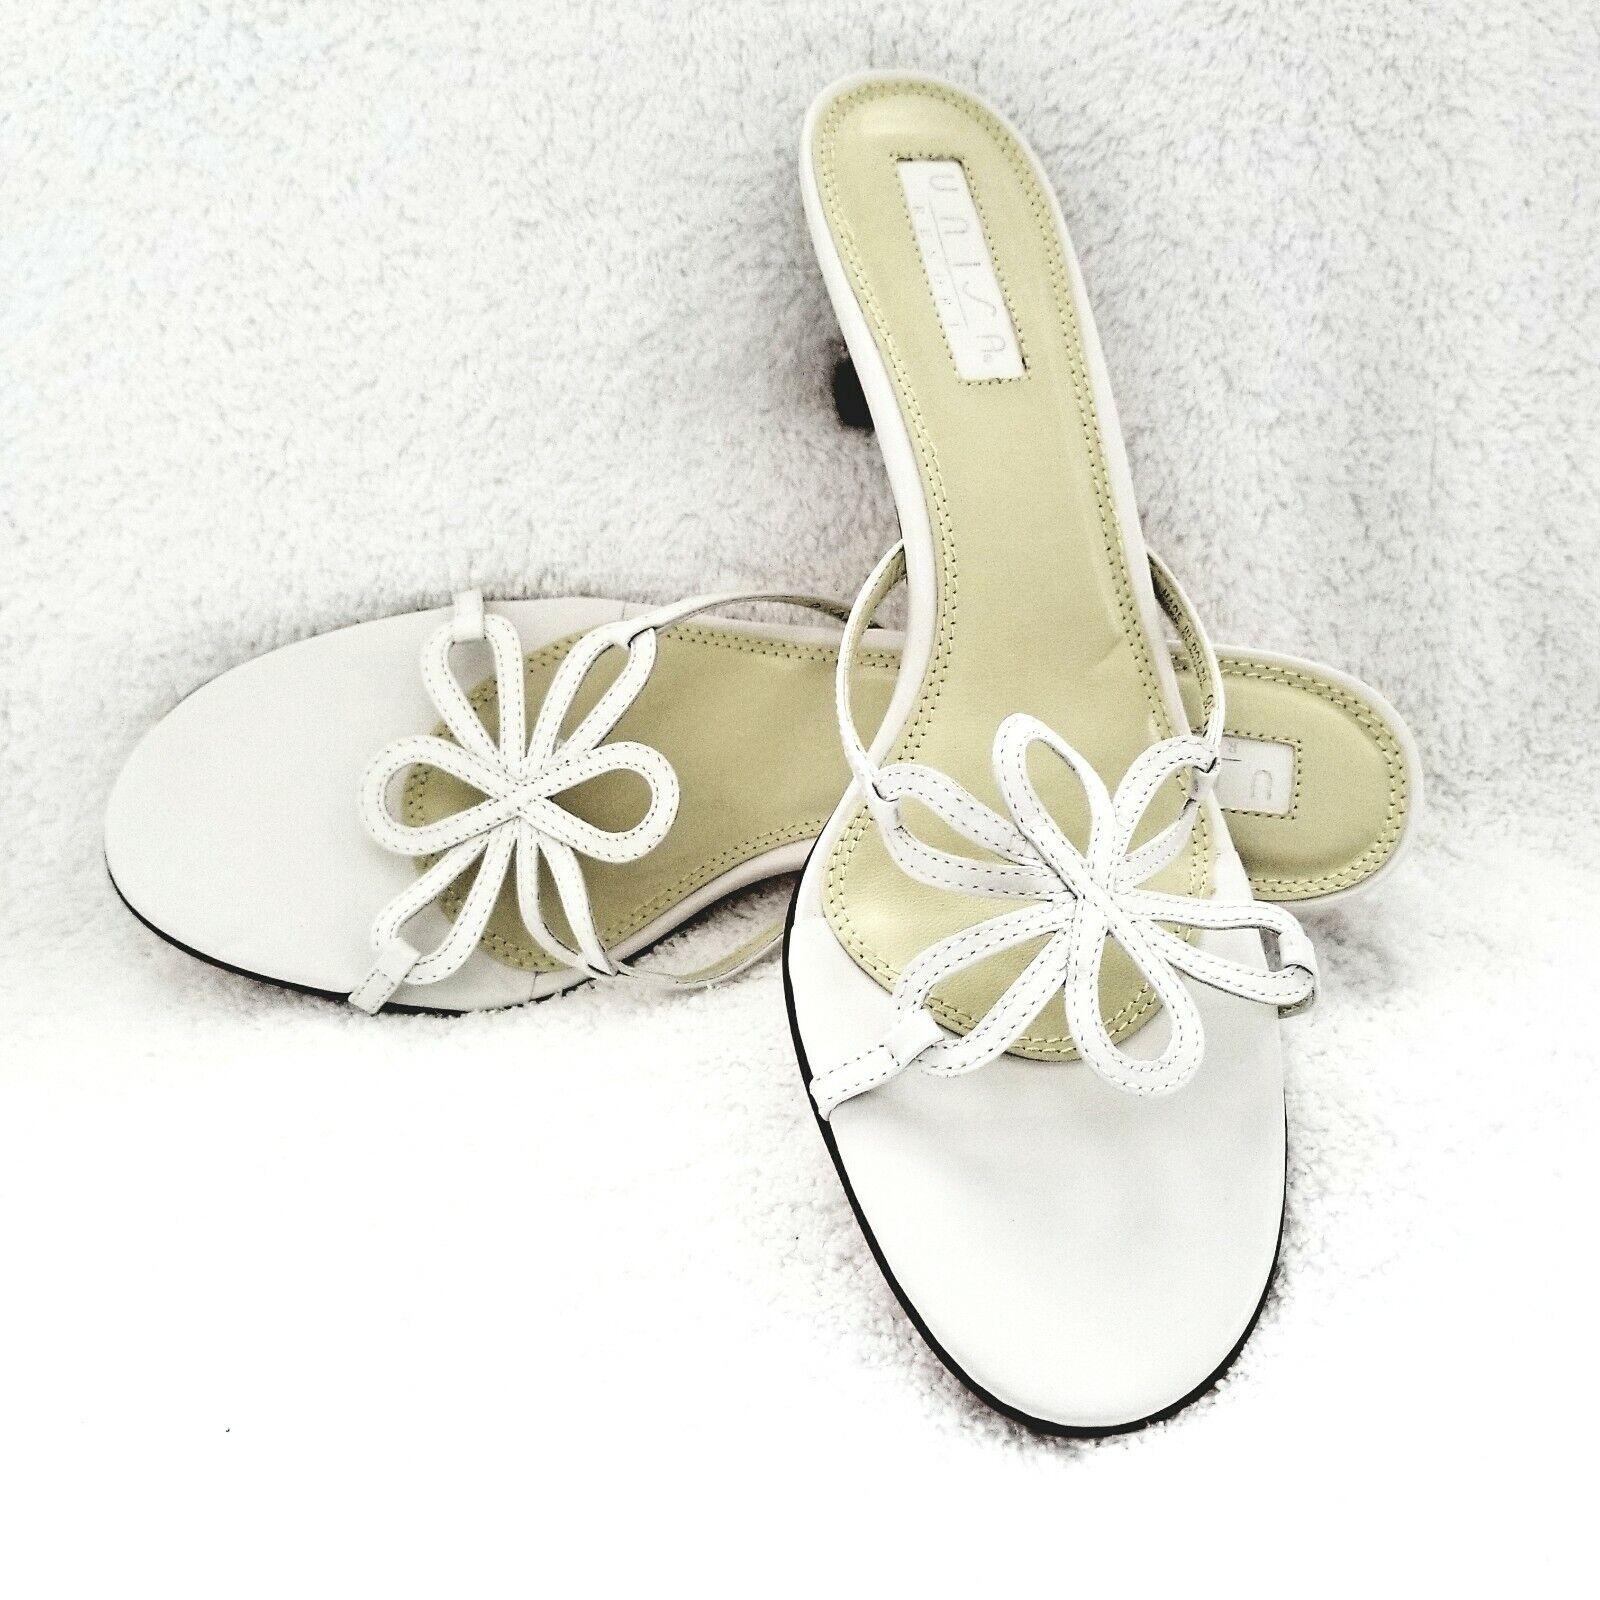 New Unisa Resort Low Heel White Slide Butterfly Butterfly Butterfly Strappy Sandals Round Toe 91 2AA eeffce